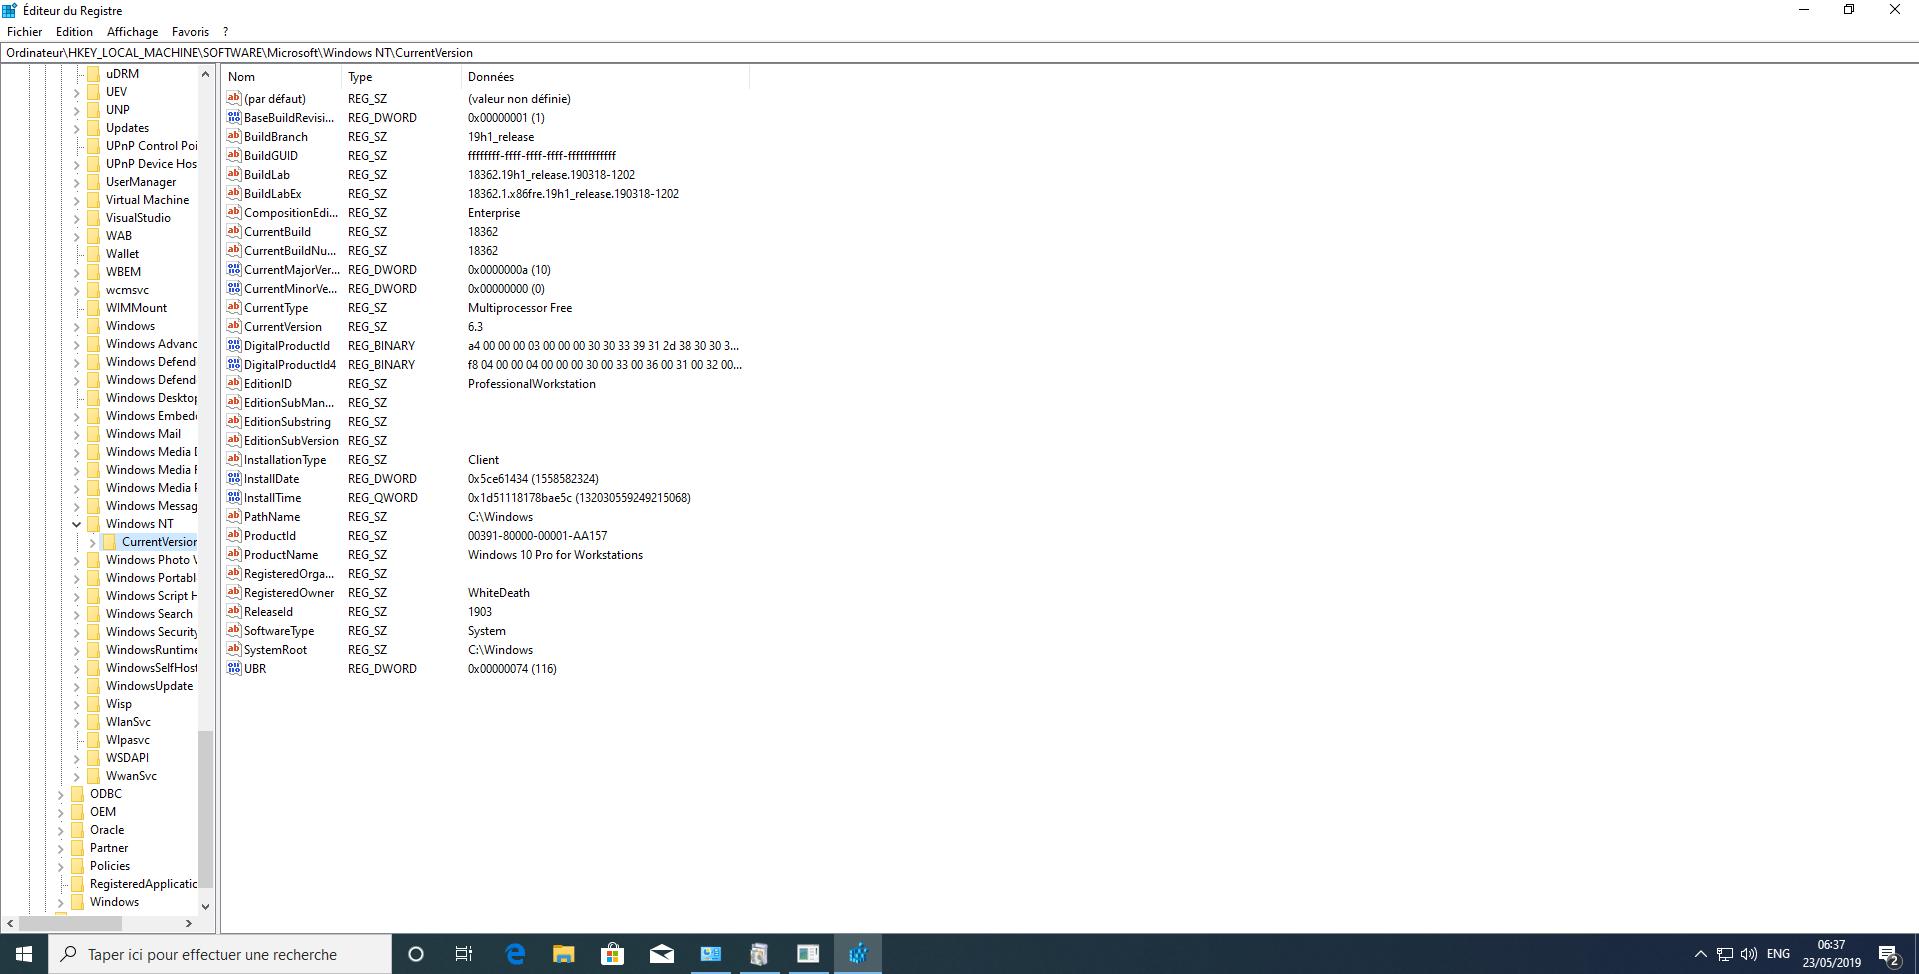 Windows 10 19H1 AIO 32in2 1903.10.0.18362.116 VL (x86-x64) Multilanguage Preactivated May 2019